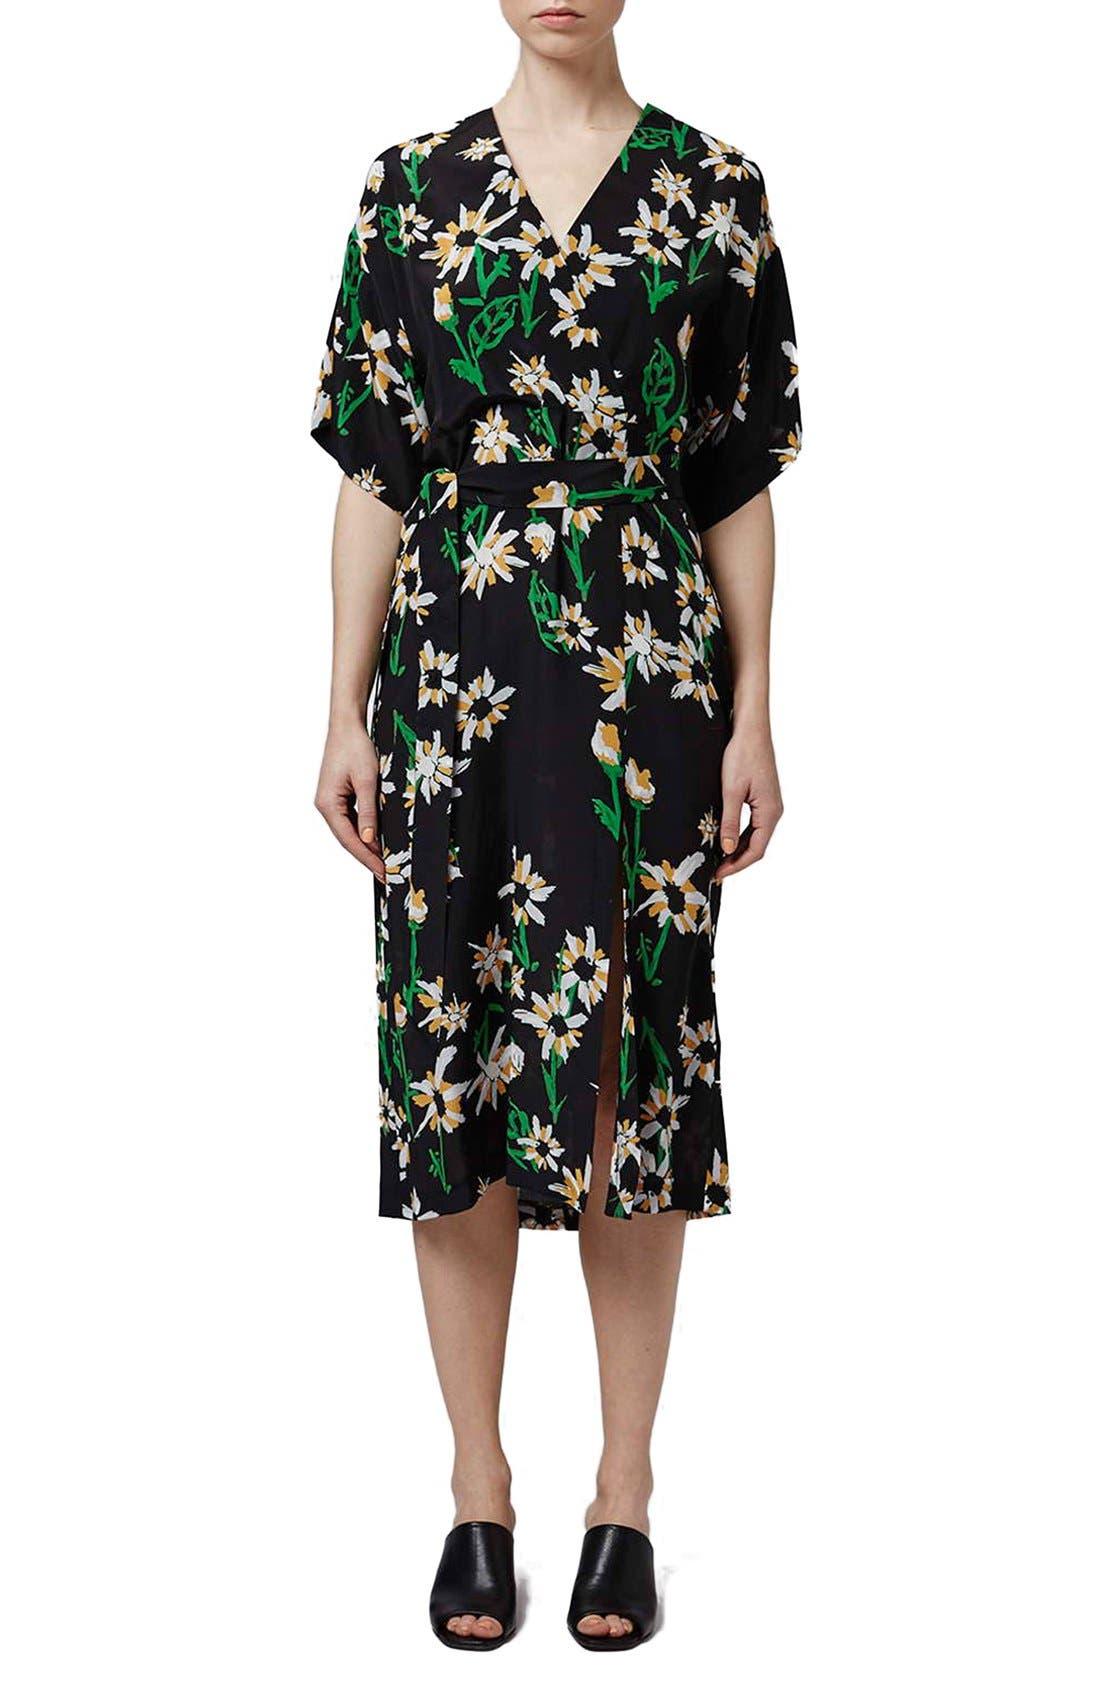 TOPSHOP BOUTIQUE Daisy Print Silk Kimono Dress, Main, color, 001